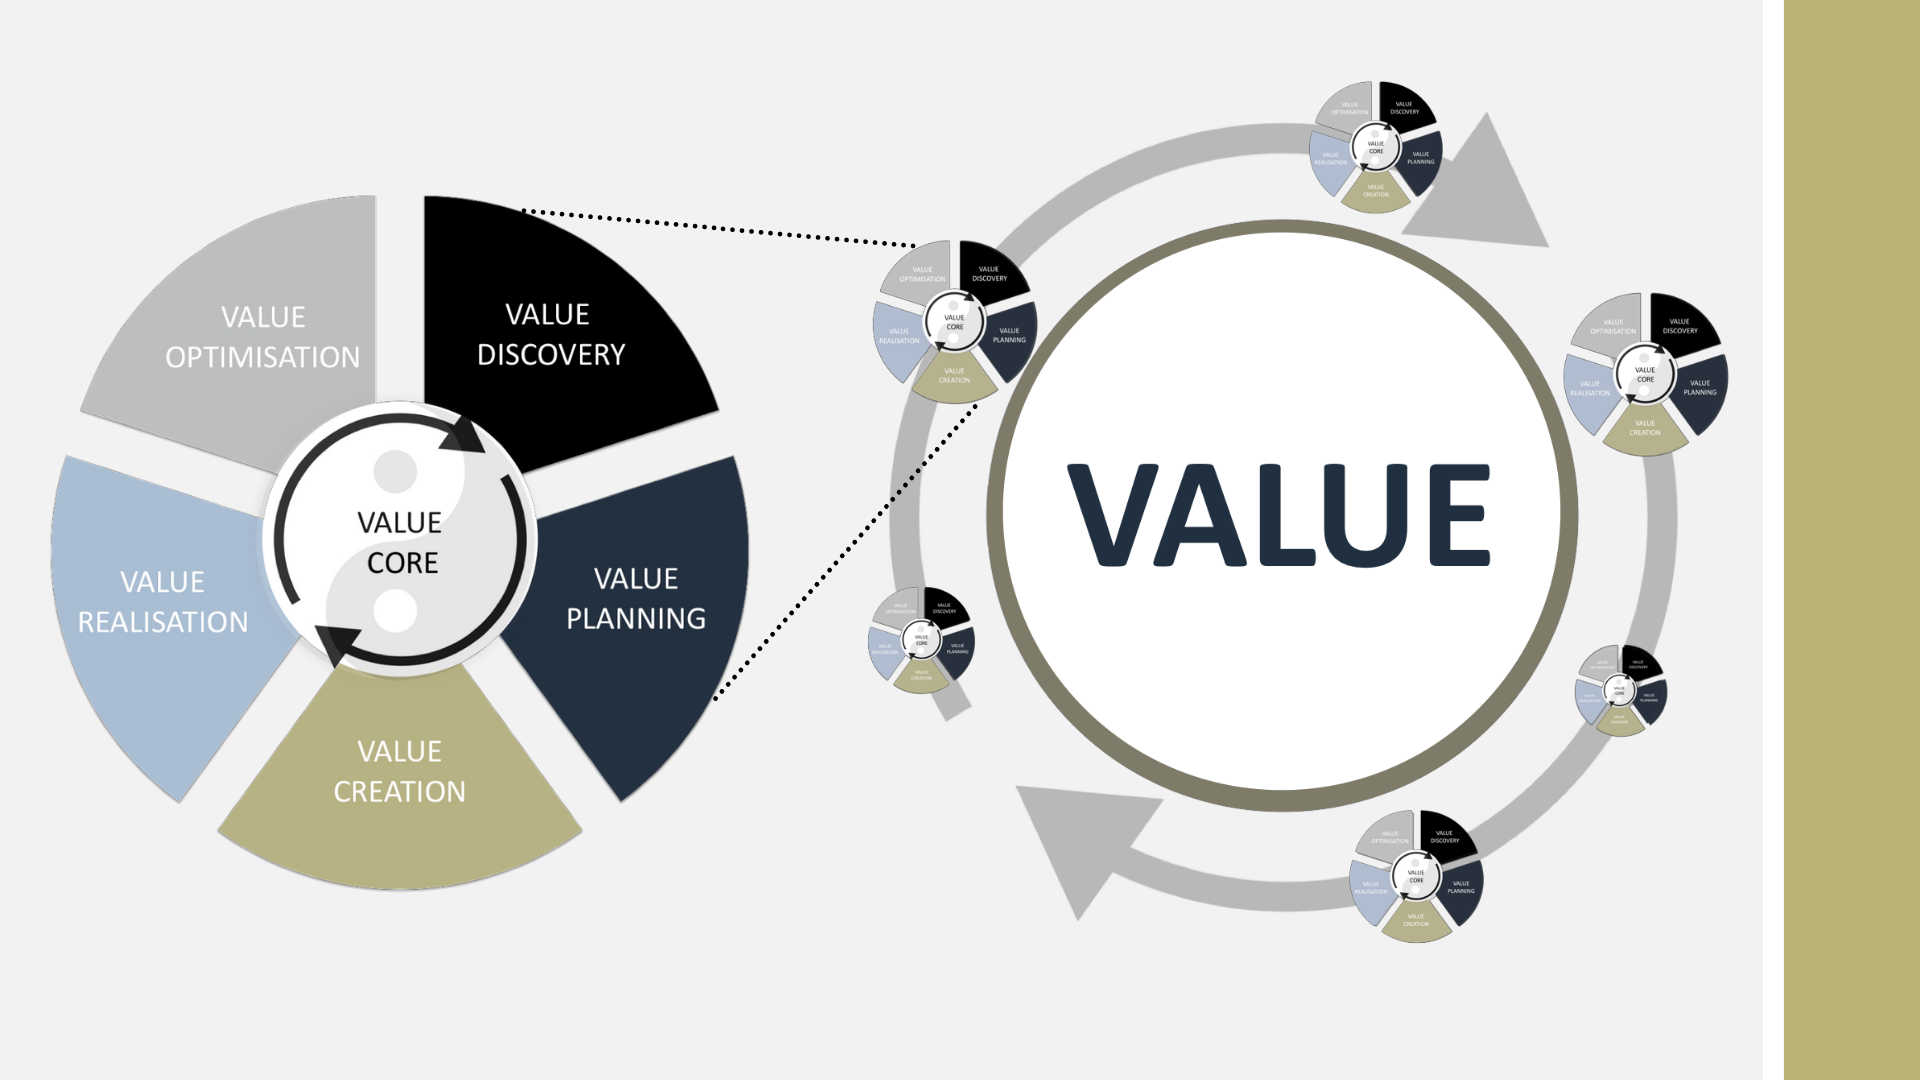 Focus on Value Call